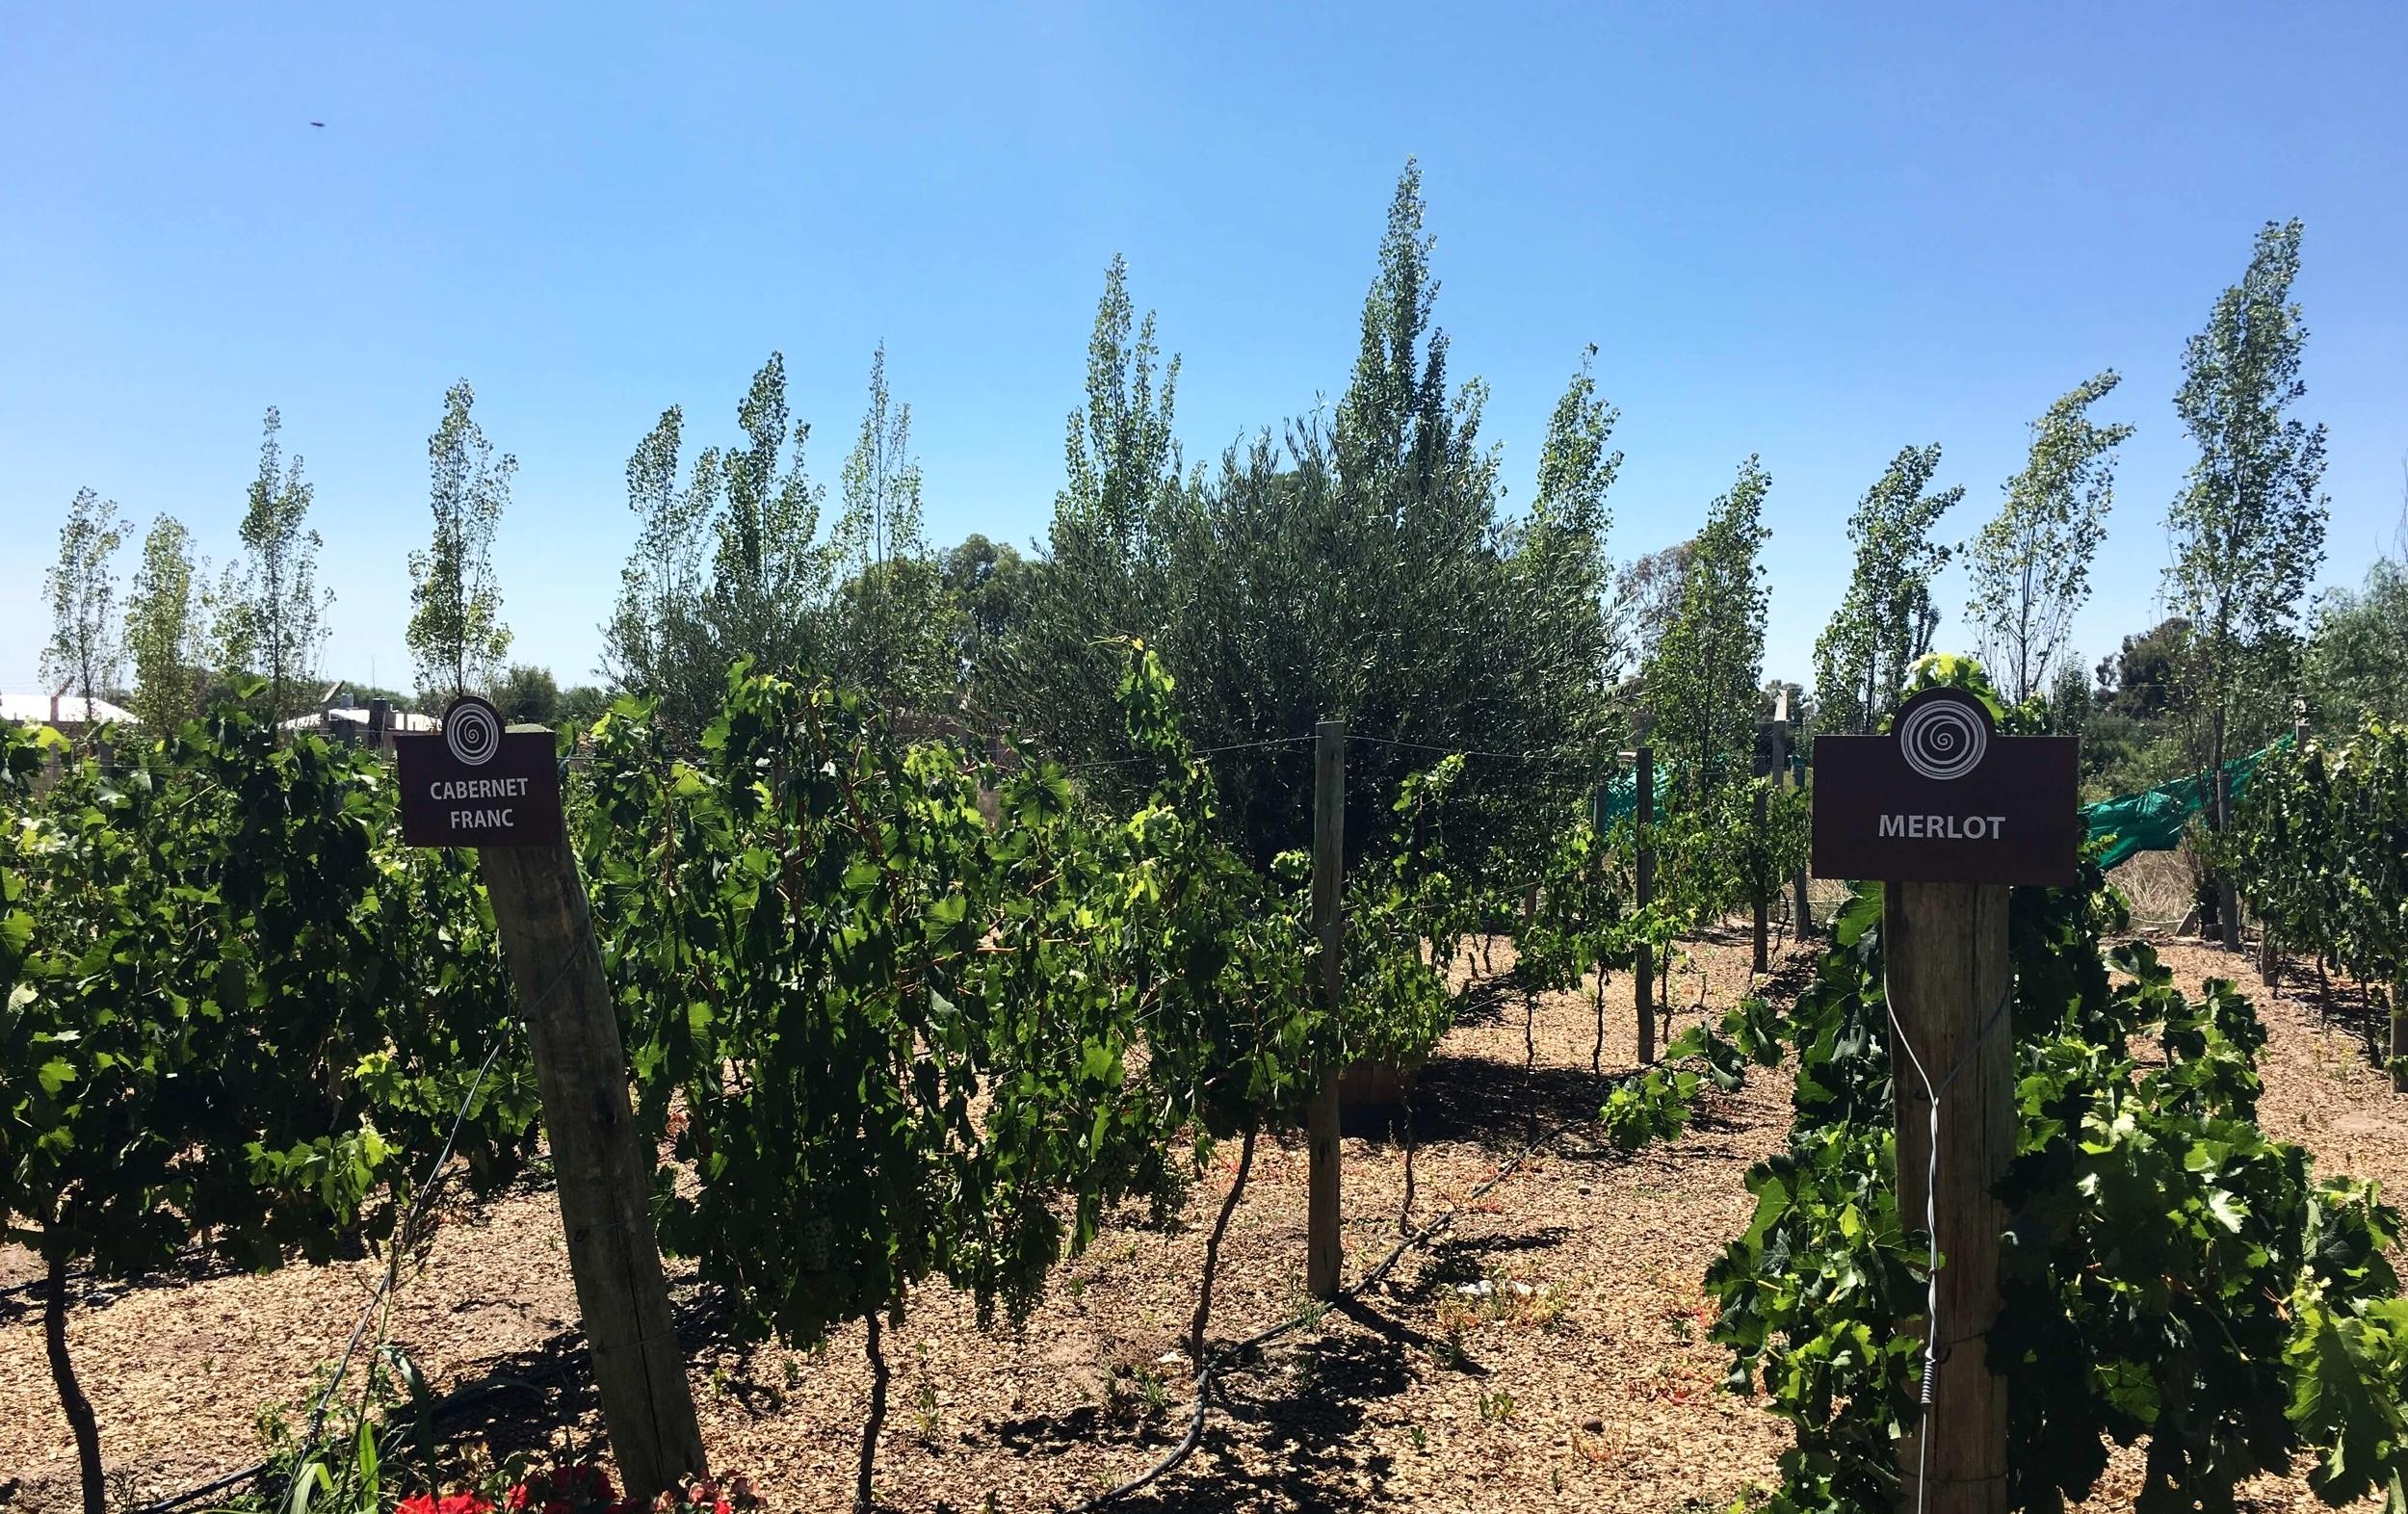 sinfin-vineyard-mendoza-maipu-ochristine